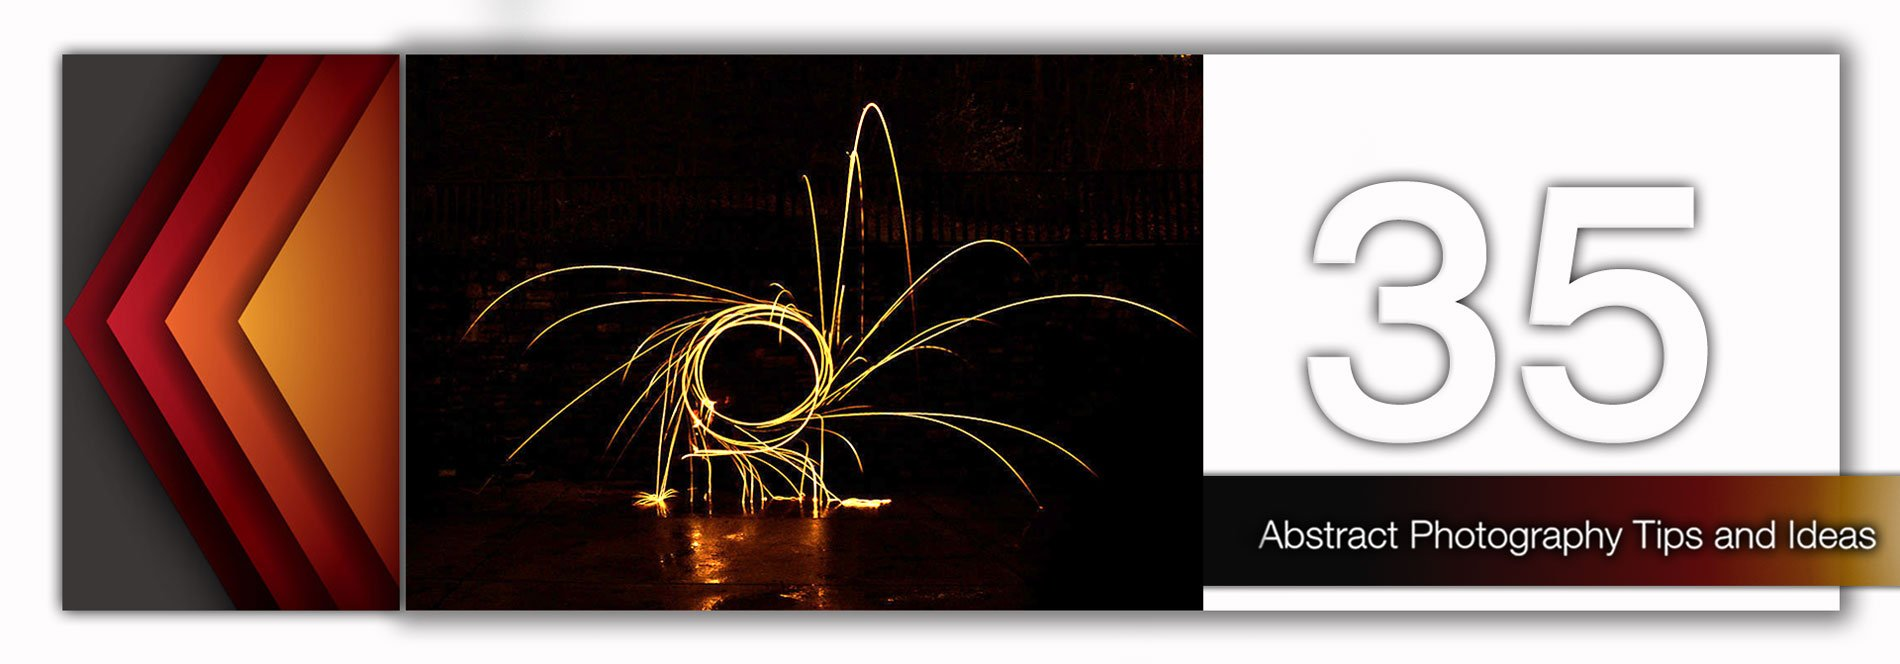 Abstract  Photography3 4 - 35 ایده و راهنما برای عکاسی انتراعی